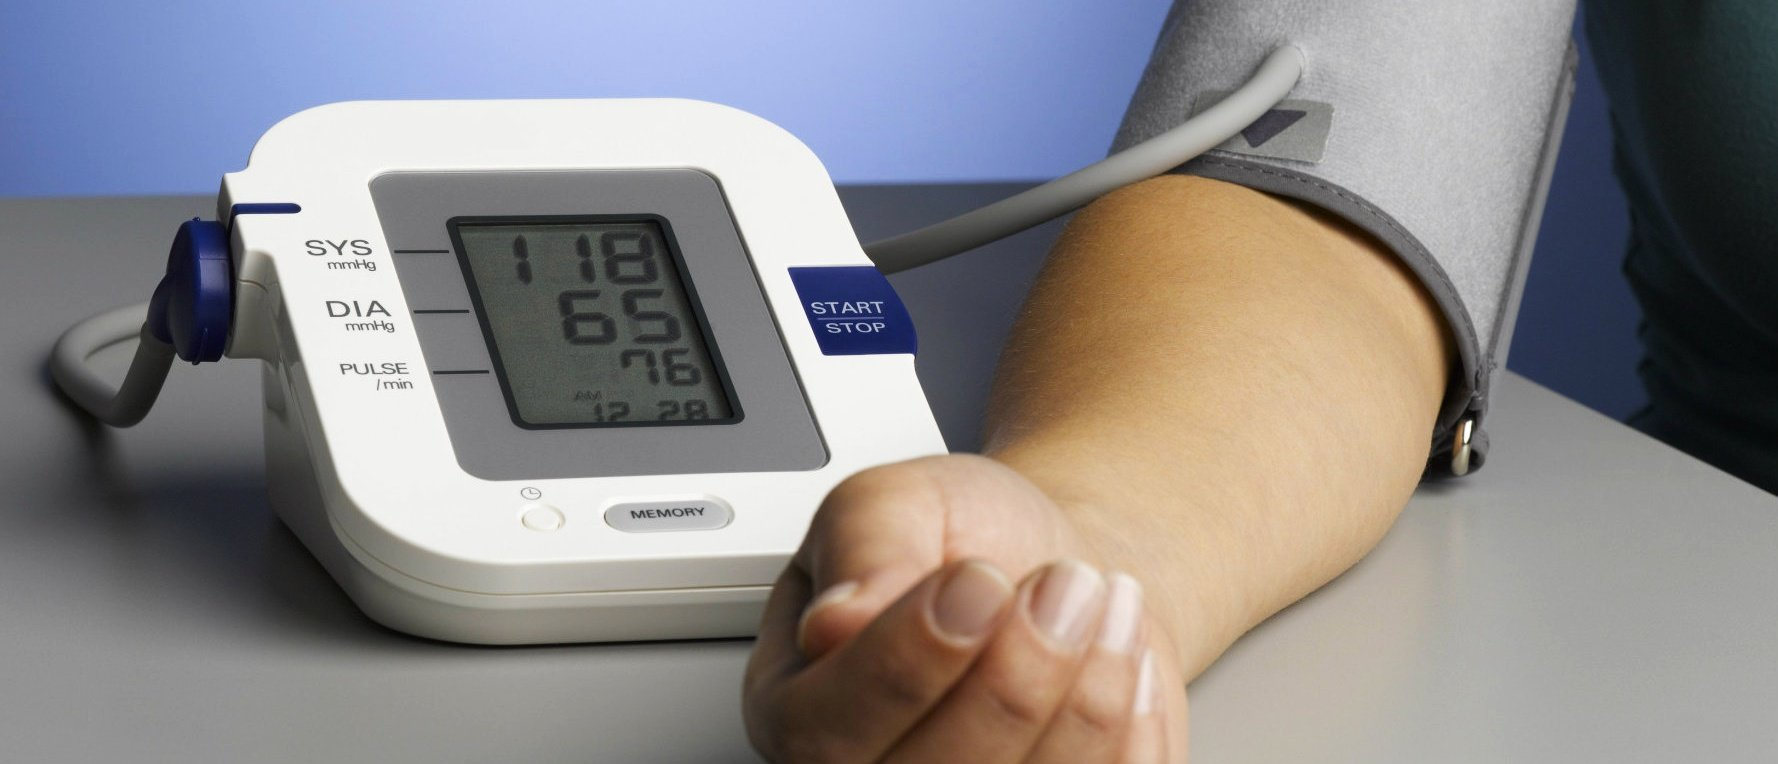 Способ помогающий при гипертонии - Valutazione del rischio di malattia ipertensiva